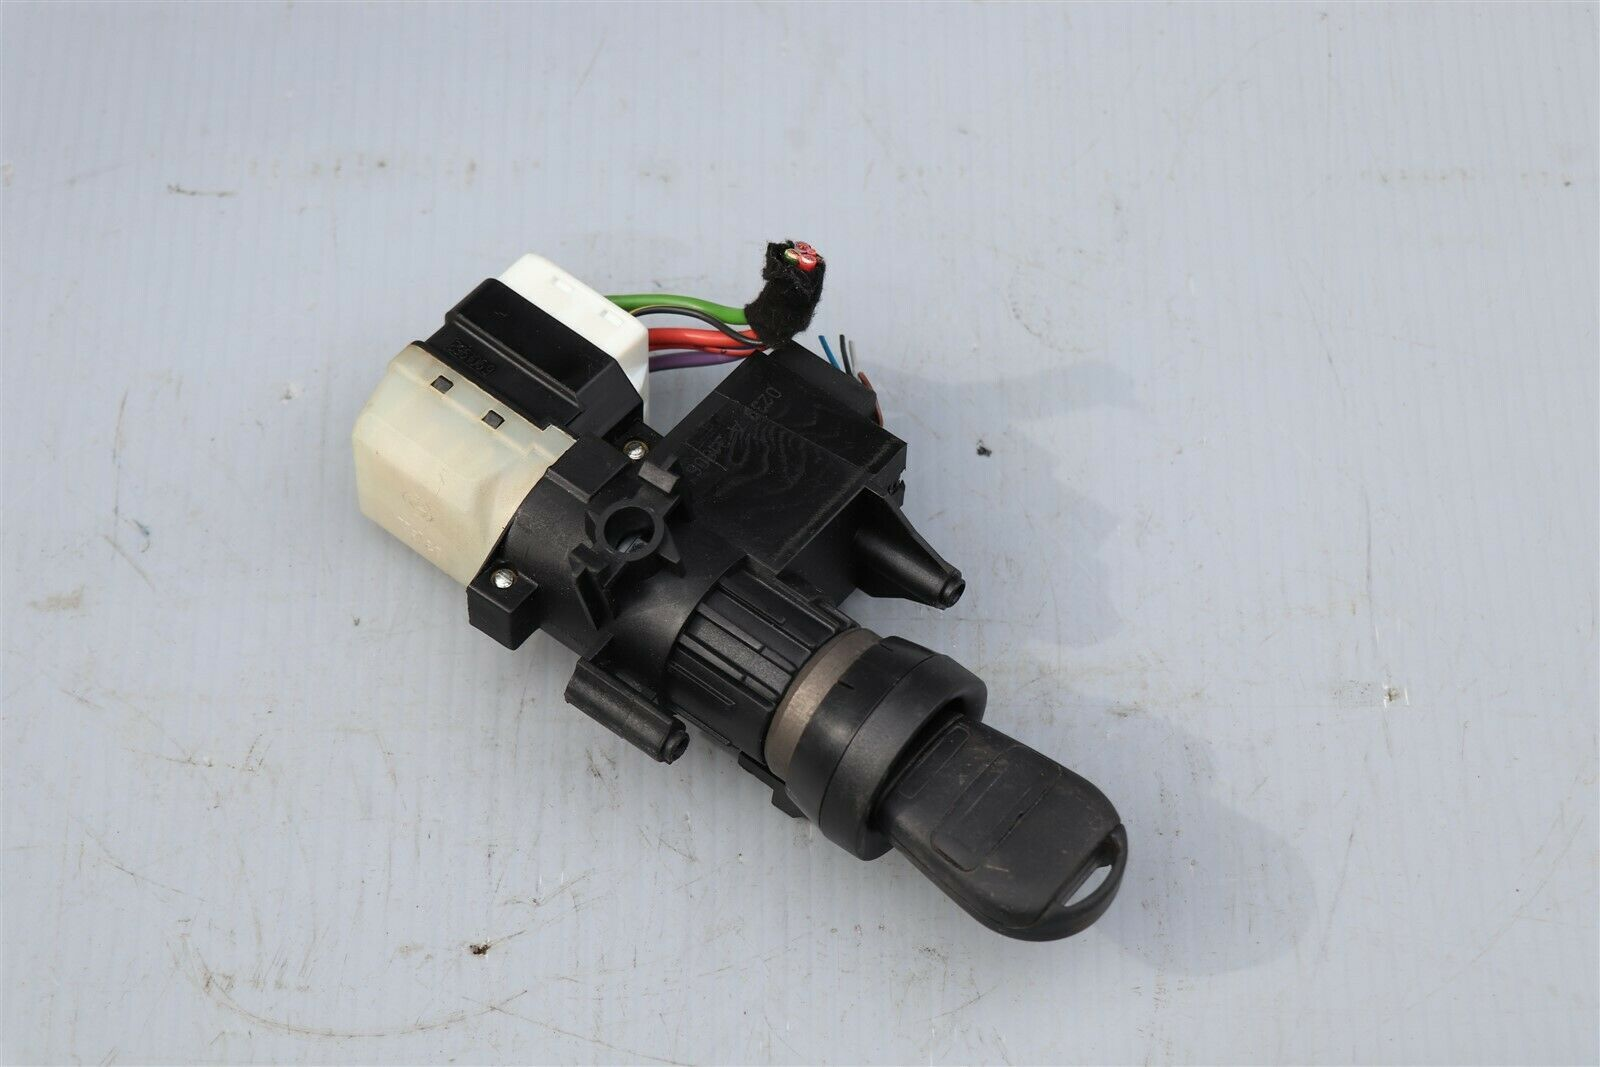 03-08 Range Rover L322 Ignition Switch W/ Key